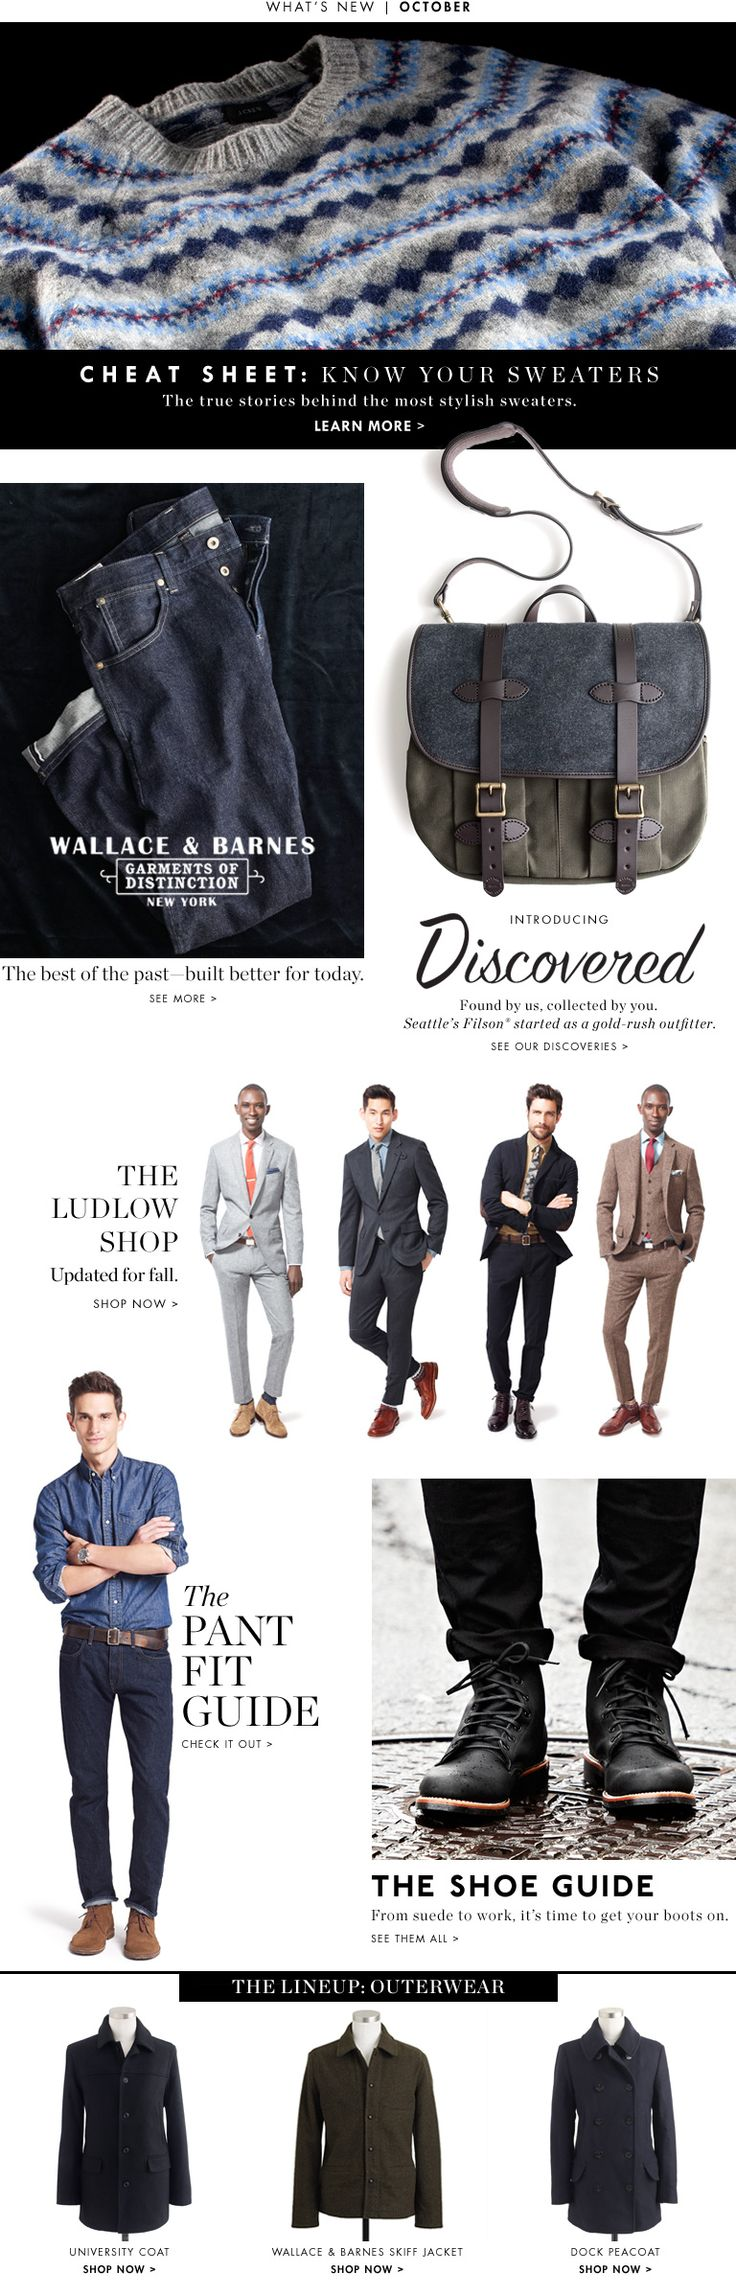 Men's Clothing - Men's Suits, Dress Shirts, Ties, Sweaters, Dress Pants, Jeans, & Accessories - J.Crew